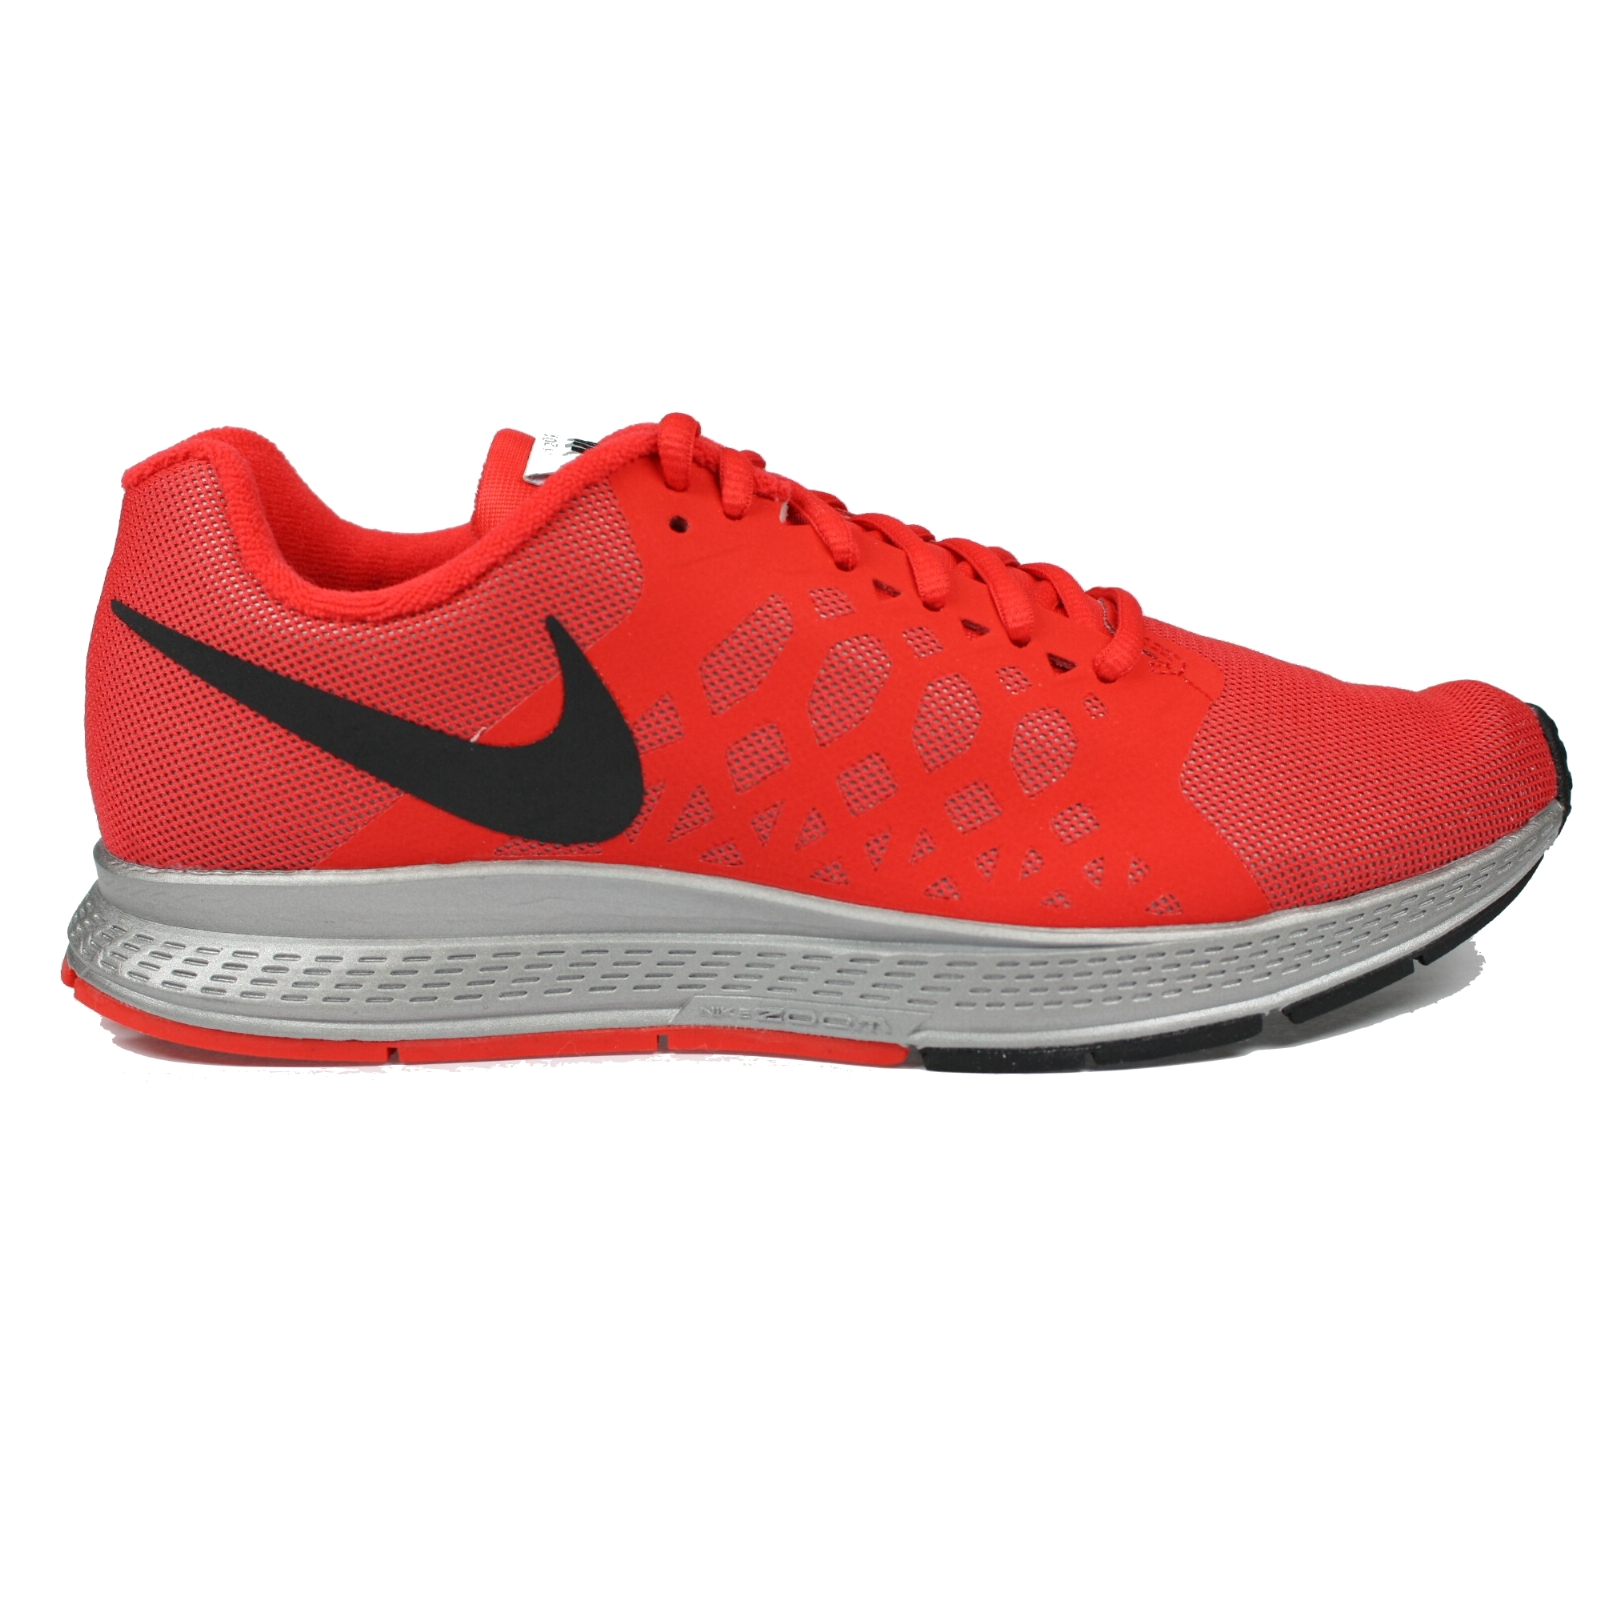 prix compétitif 7ee4e 7c503 Nike Air Zoom Pegasus 31 Nike Air Zoom Pegasus 31 Review ...